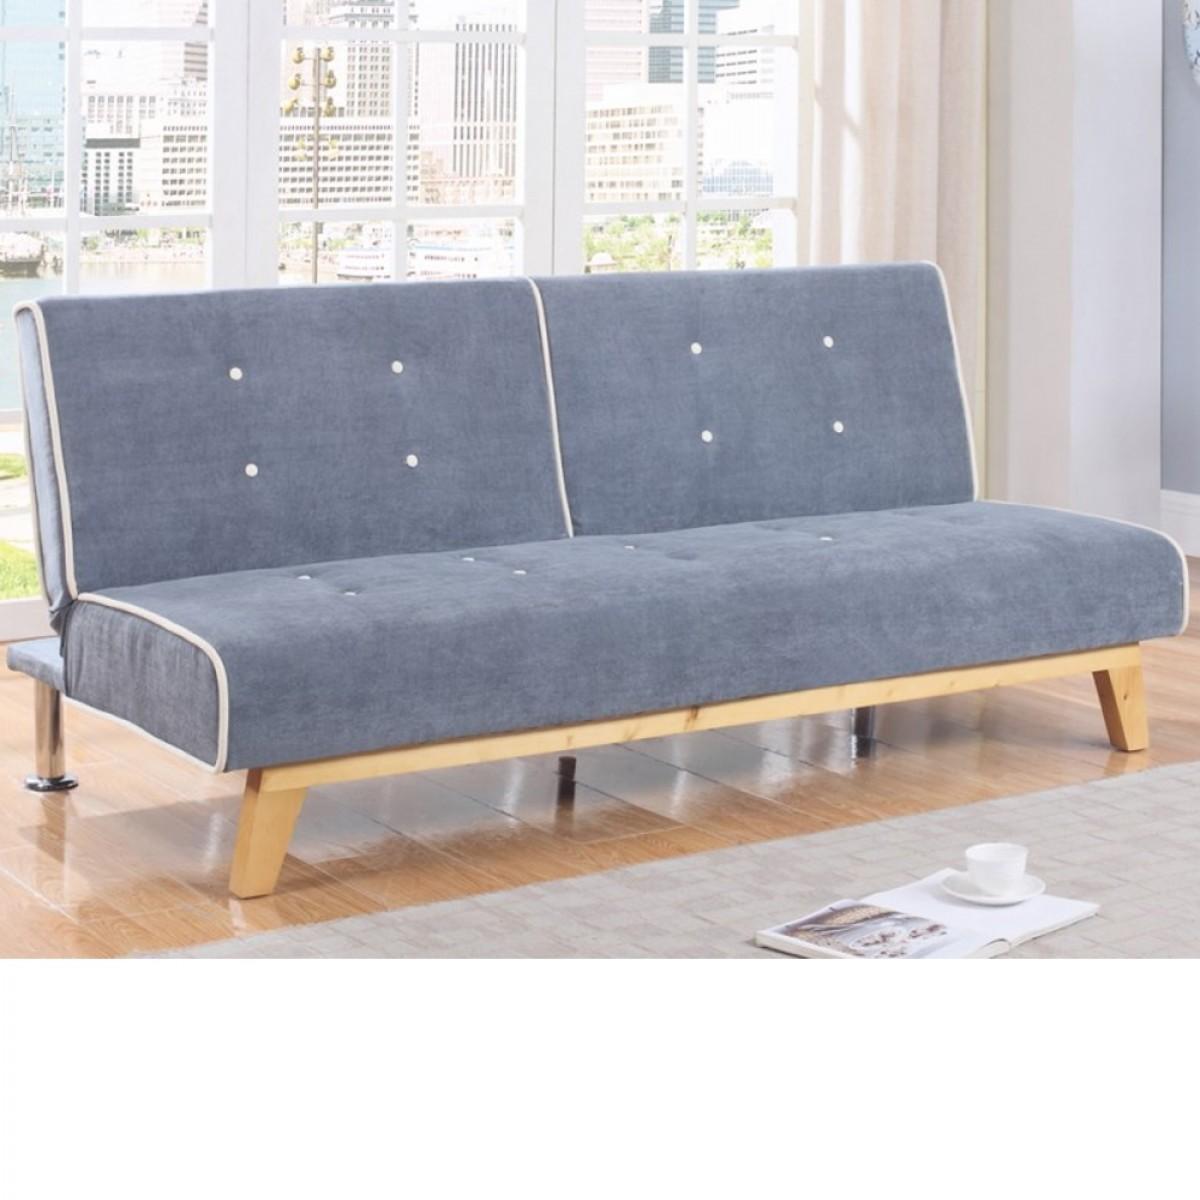 Phenomenal Jackson Grey Fabric Sofa Bed Ibusinesslaw Wood Chair Design Ideas Ibusinesslaworg